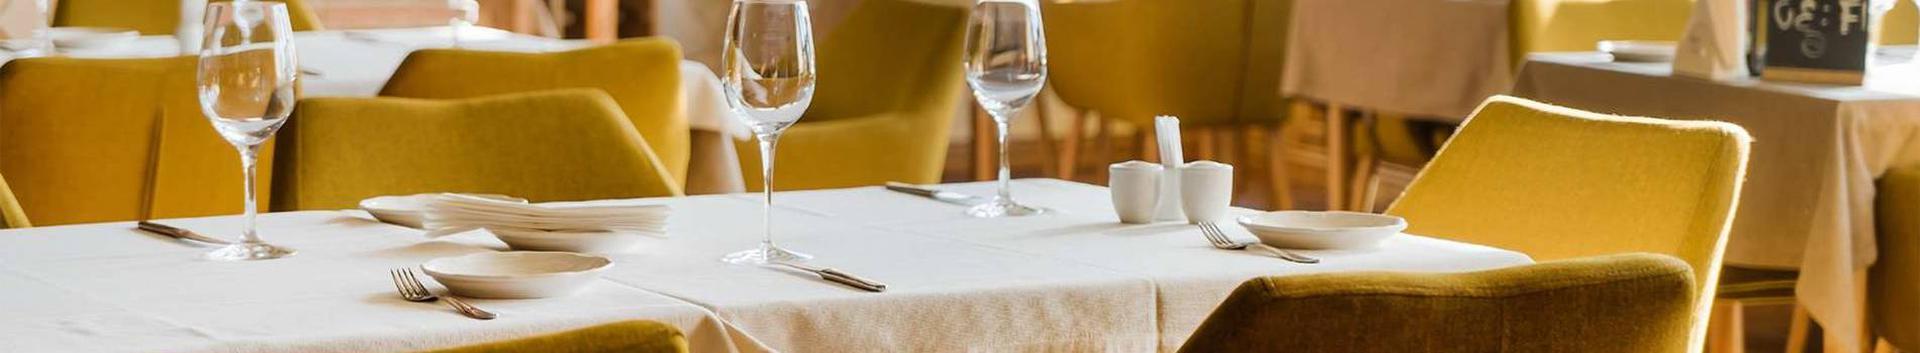 56101_toitlustus-restoran-jm-_54150475_xl.jpg